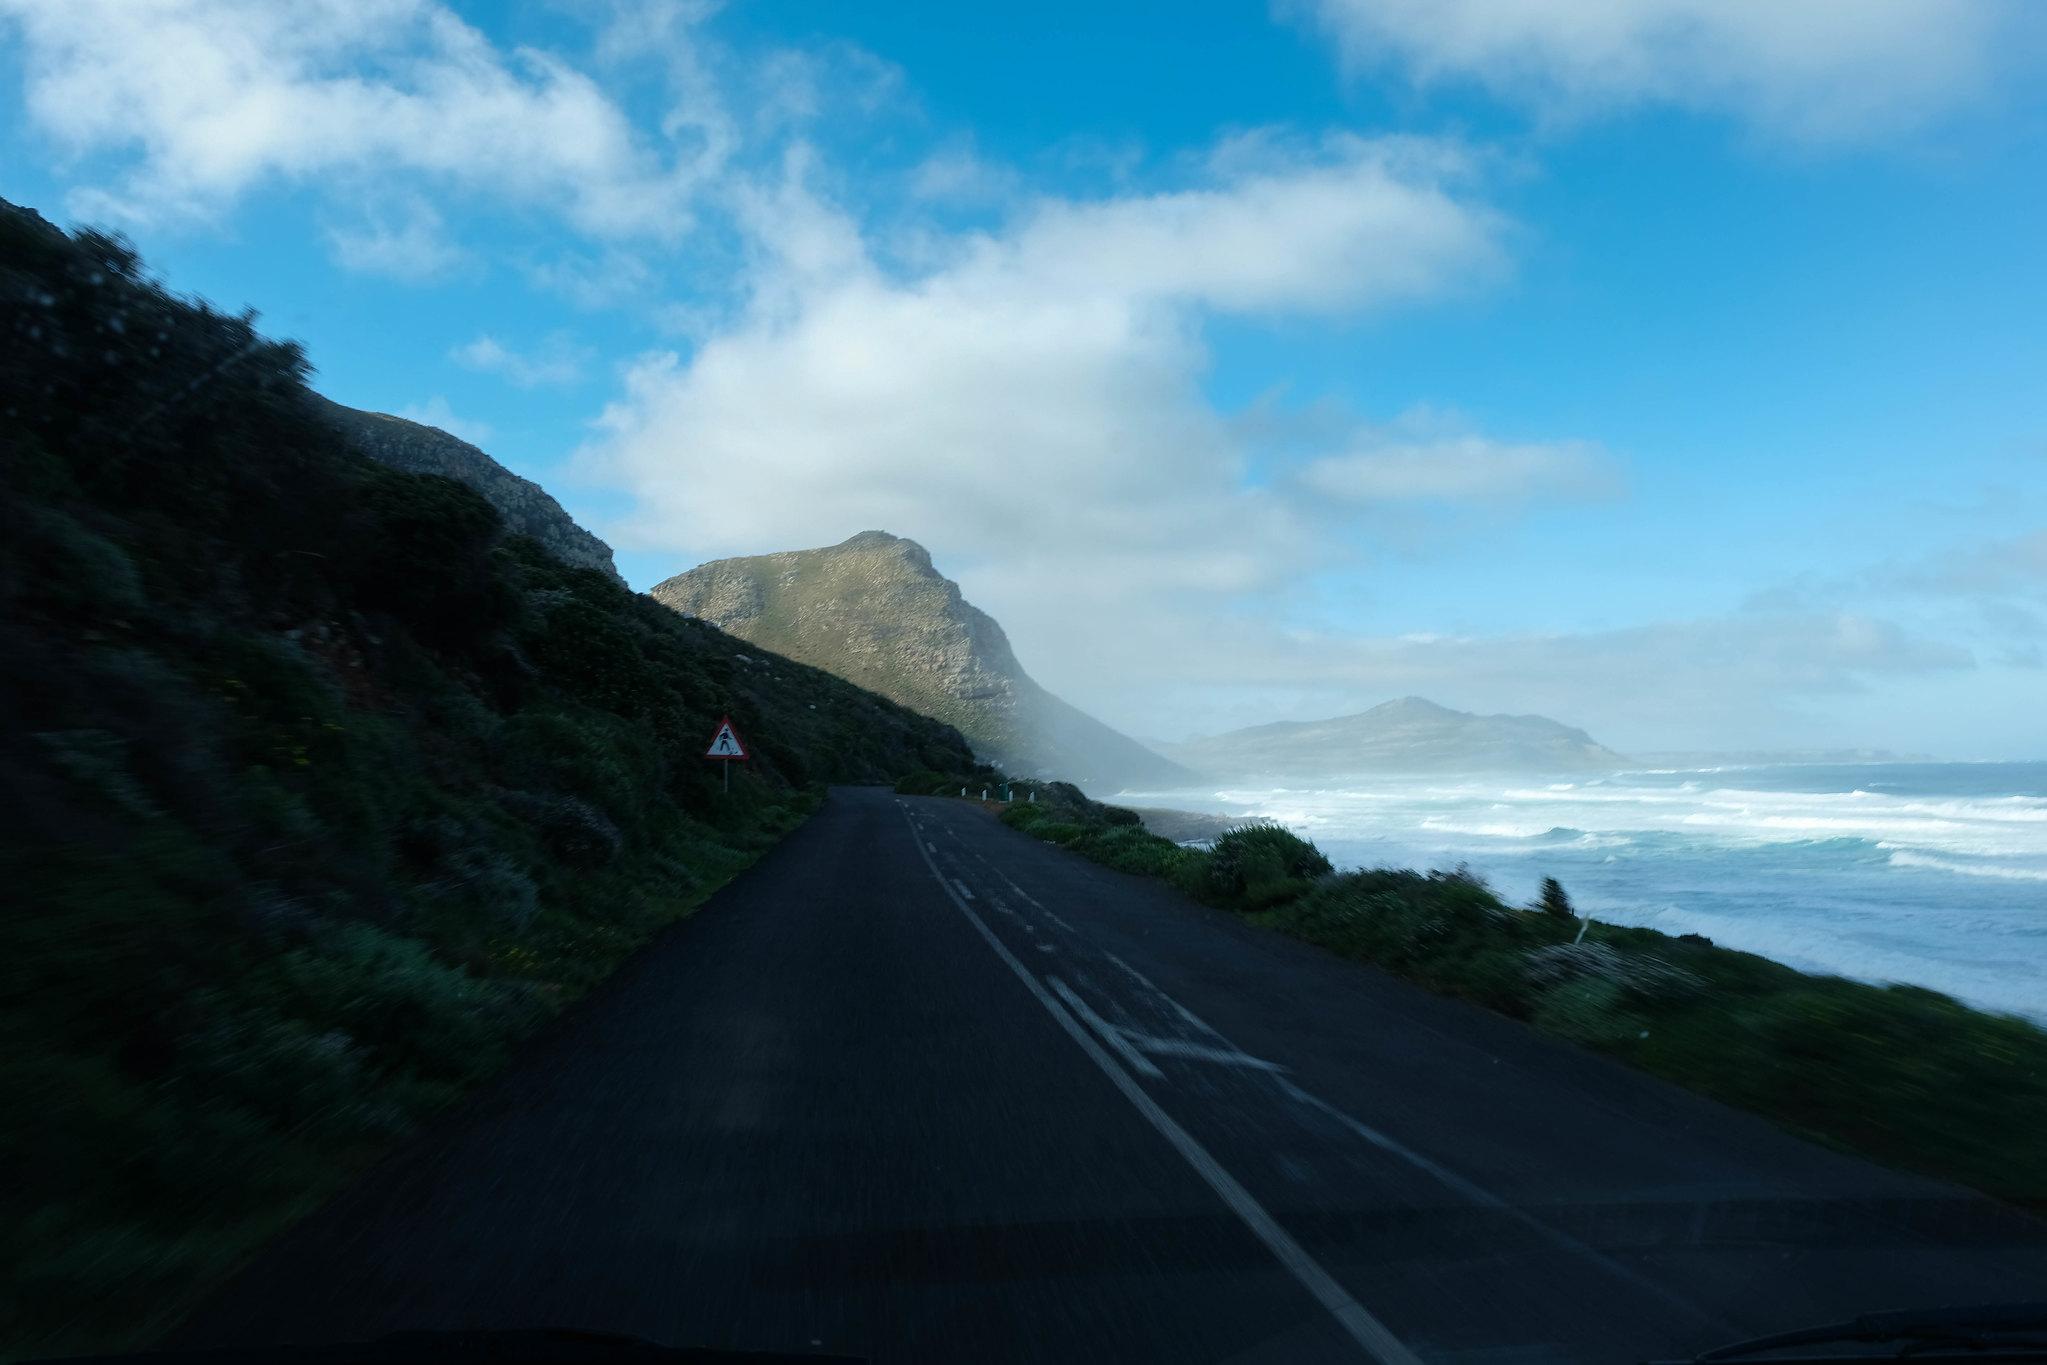 Road trip around the cape!